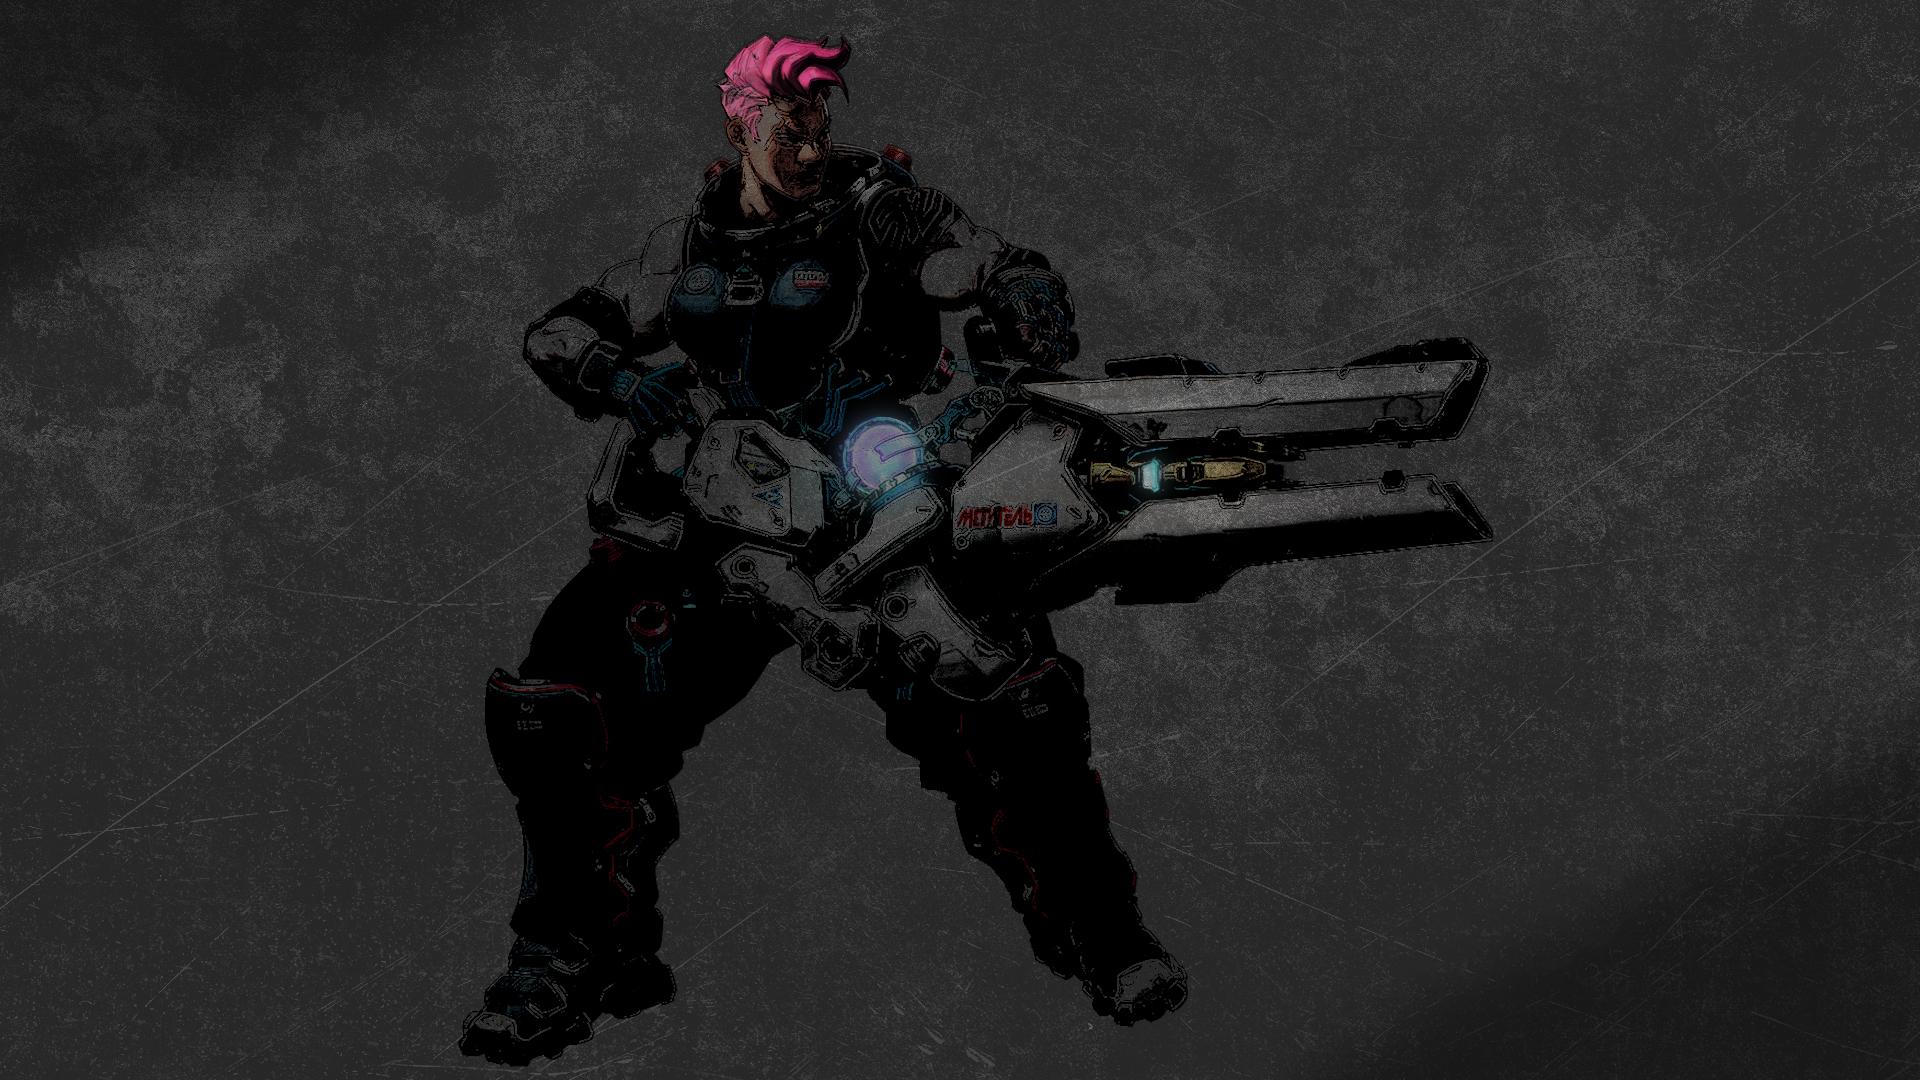 General 1920x1080 Overwatch Zarya (Overwatch) video game art pink hair video games